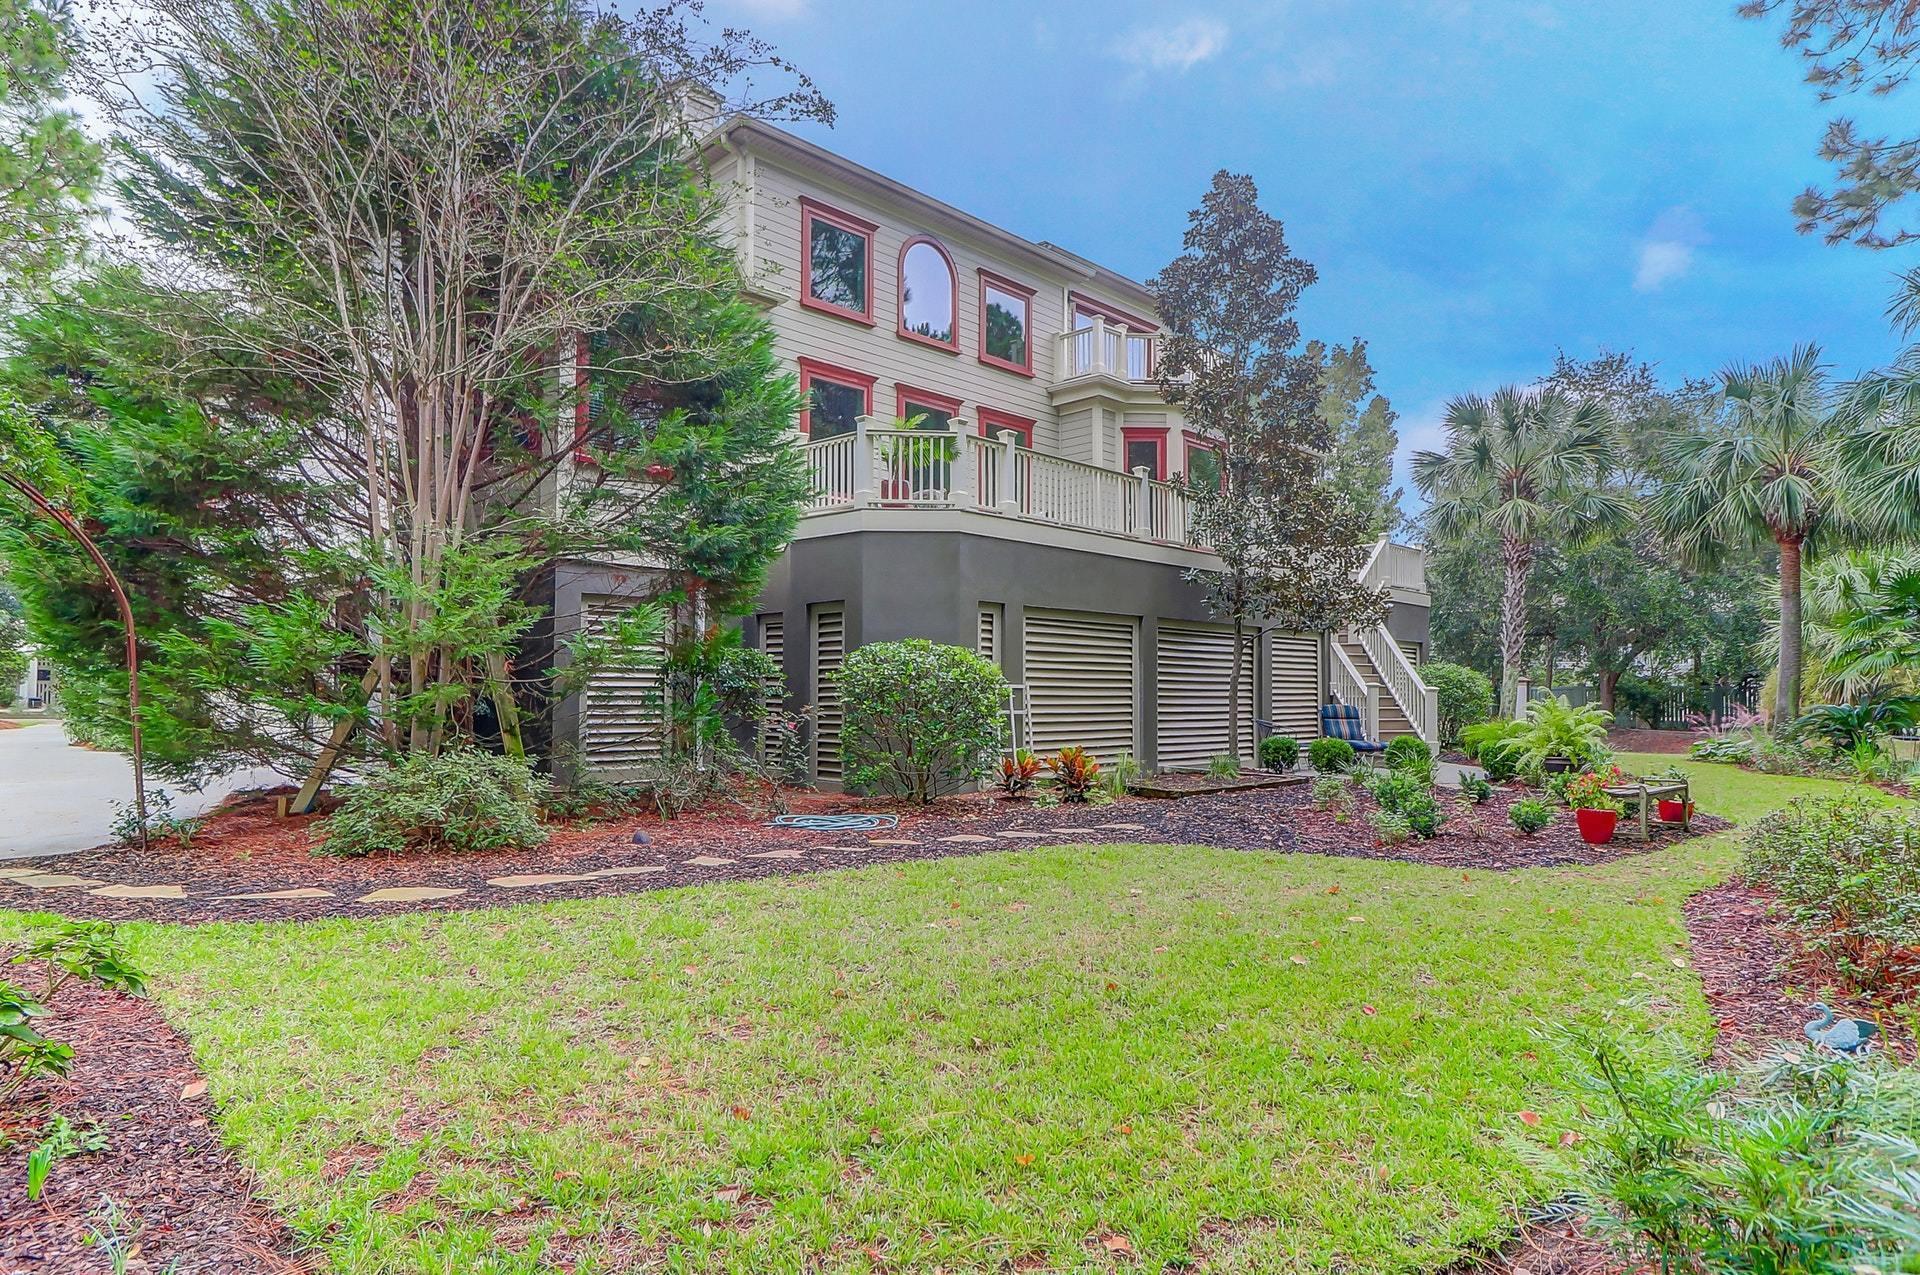 Back Bay Village Homes For Sale - 301 Indigo Bay, Mount Pleasant, SC - 41